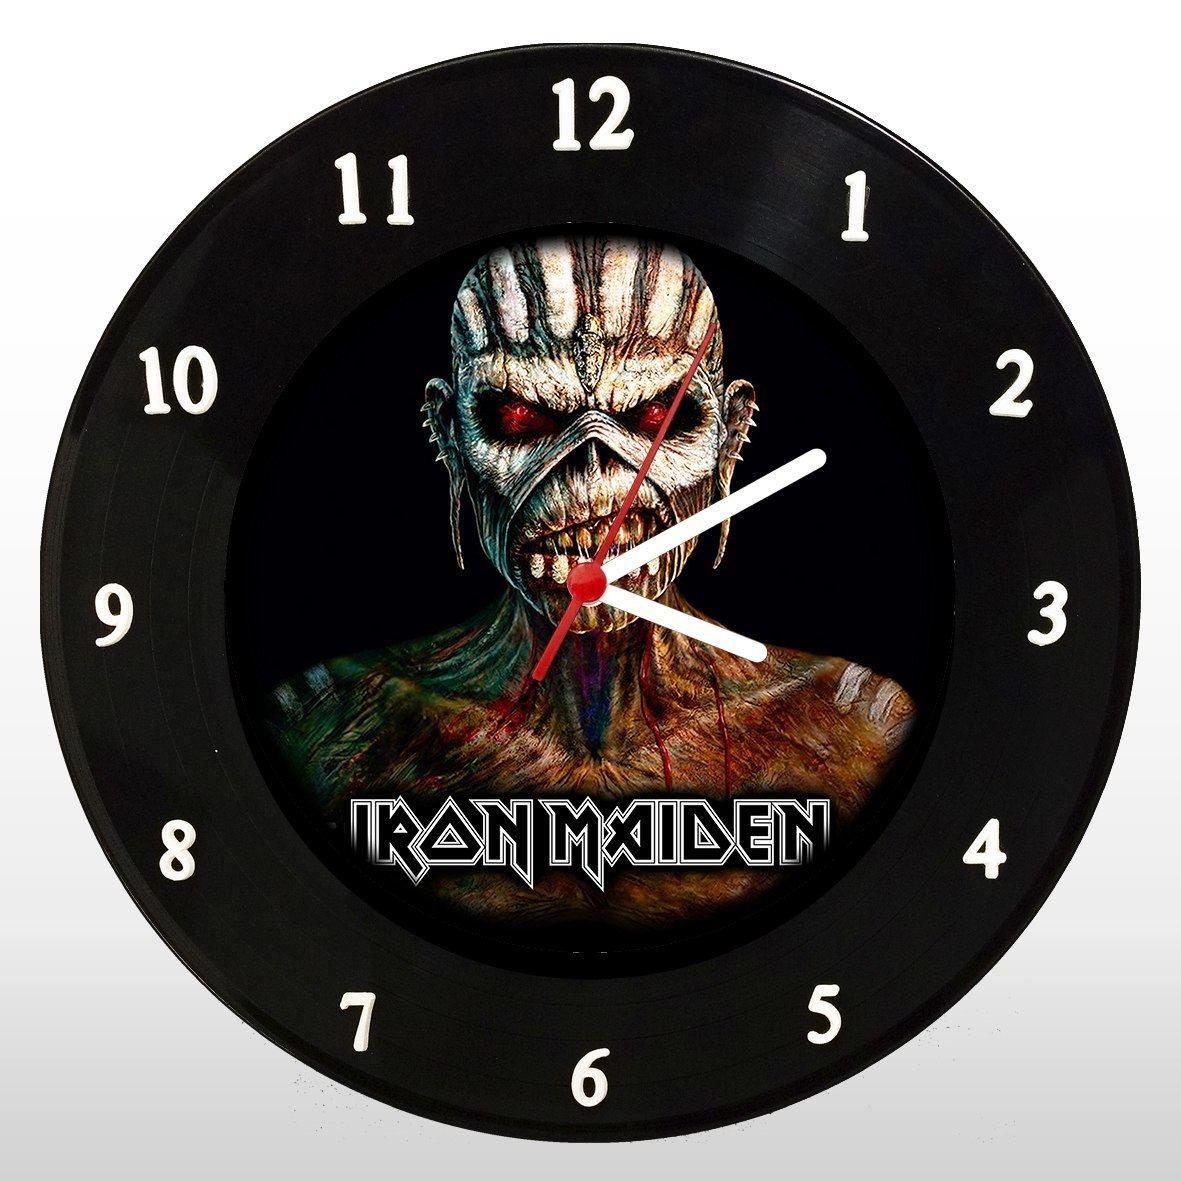 Iron Maiden - The Book of Souls - Relógio de Parede em Disco de Vinil - Mr. Rock